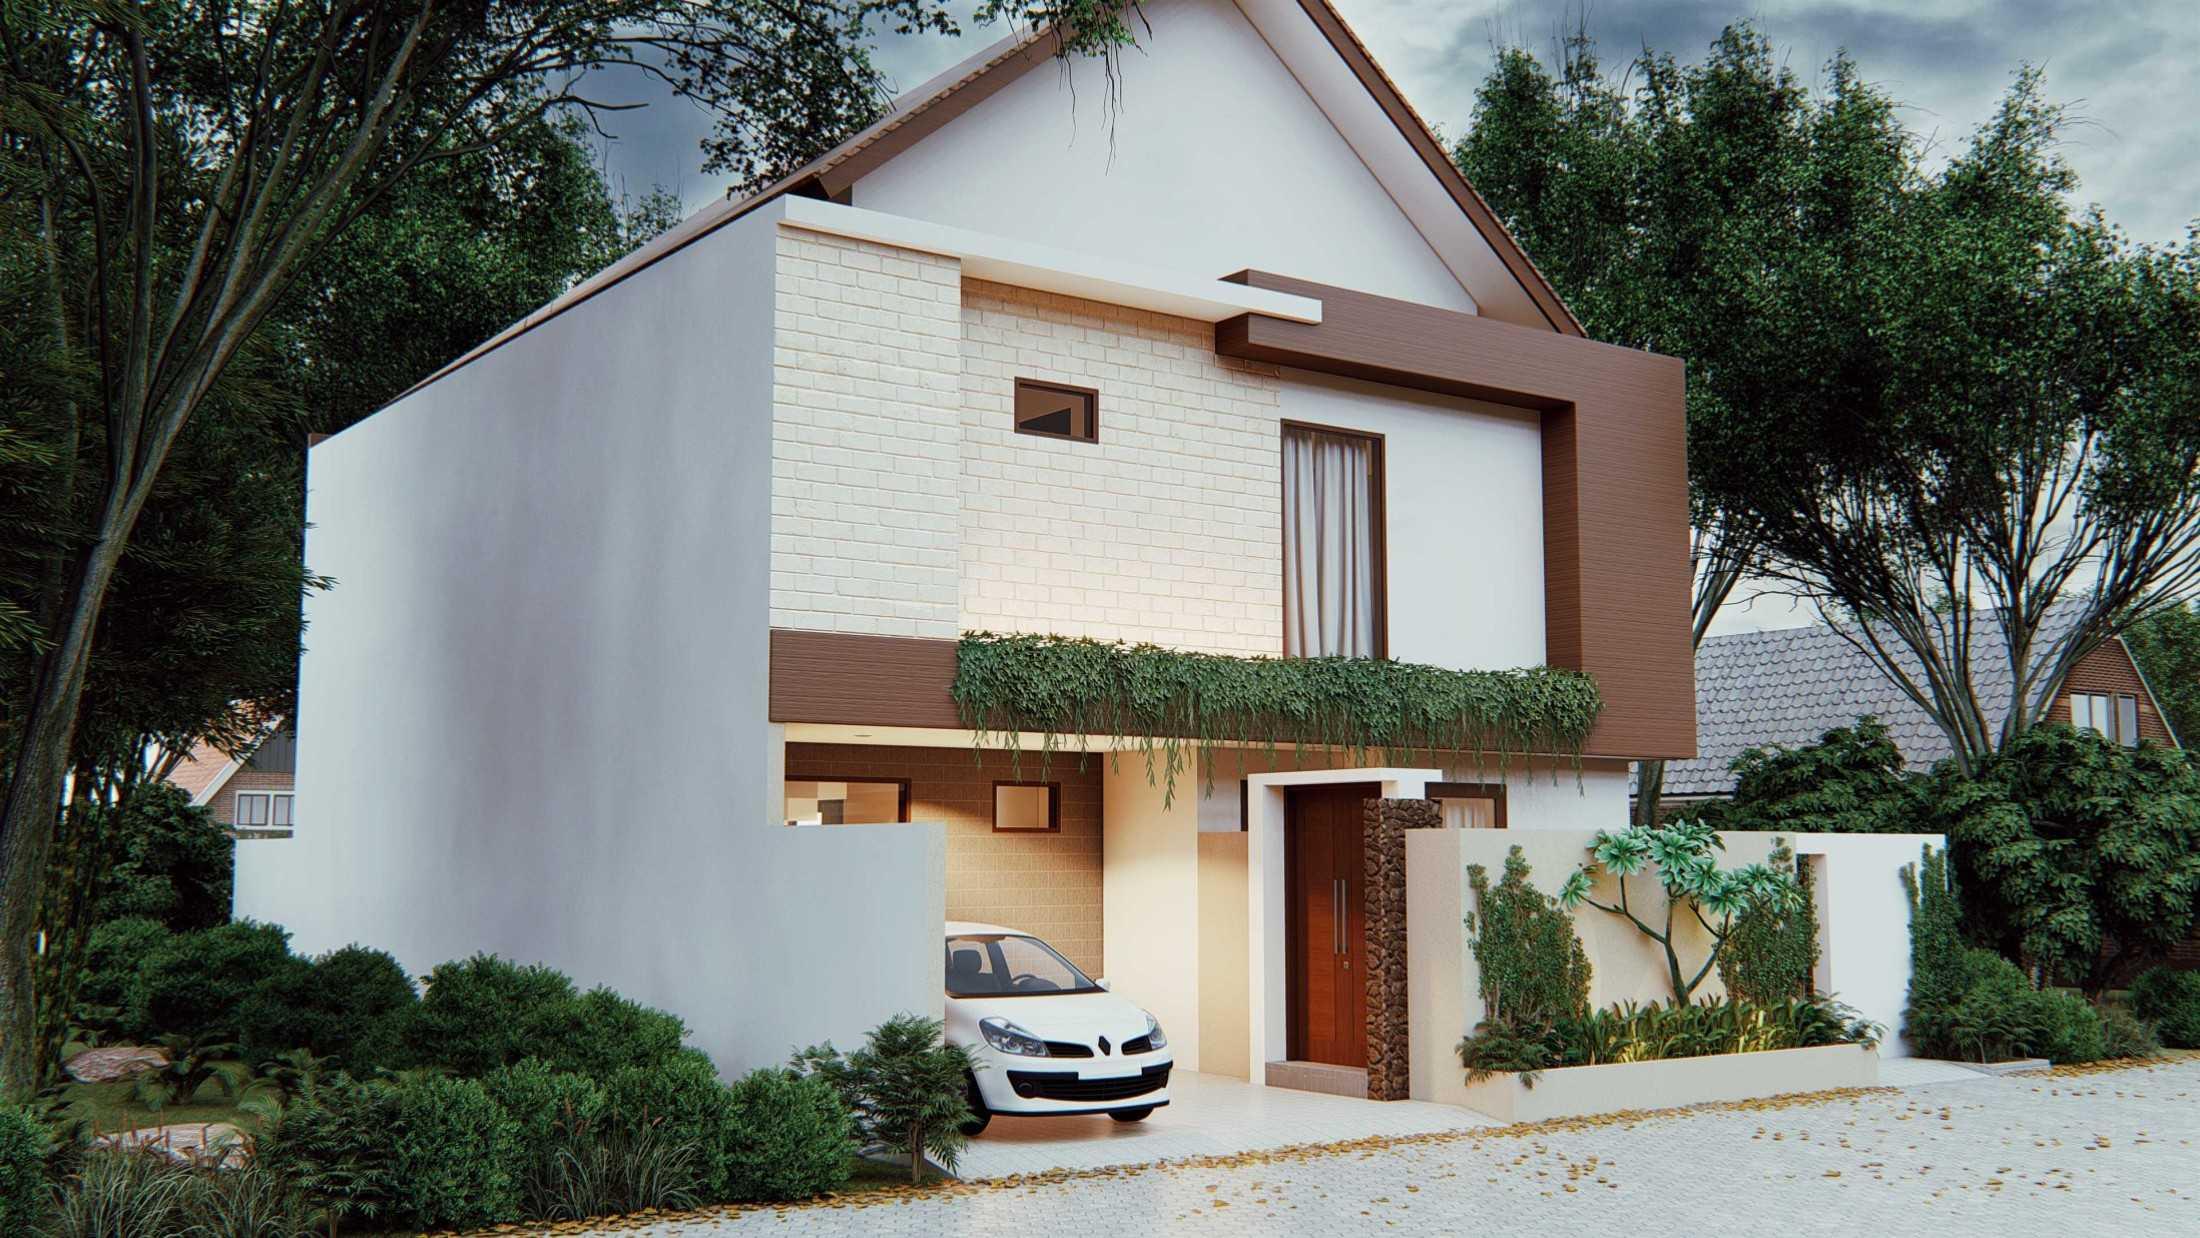 Sequal Design & Construction C Villa Design Canggu, Kec. Kuta Utara, Kabupaten Badung, Bali, Indonesia Canggu, Kec. Kuta Utara, Kabupaten Badung, Bali, Indonesia Sequal-Design-C-Villa-Design  112274